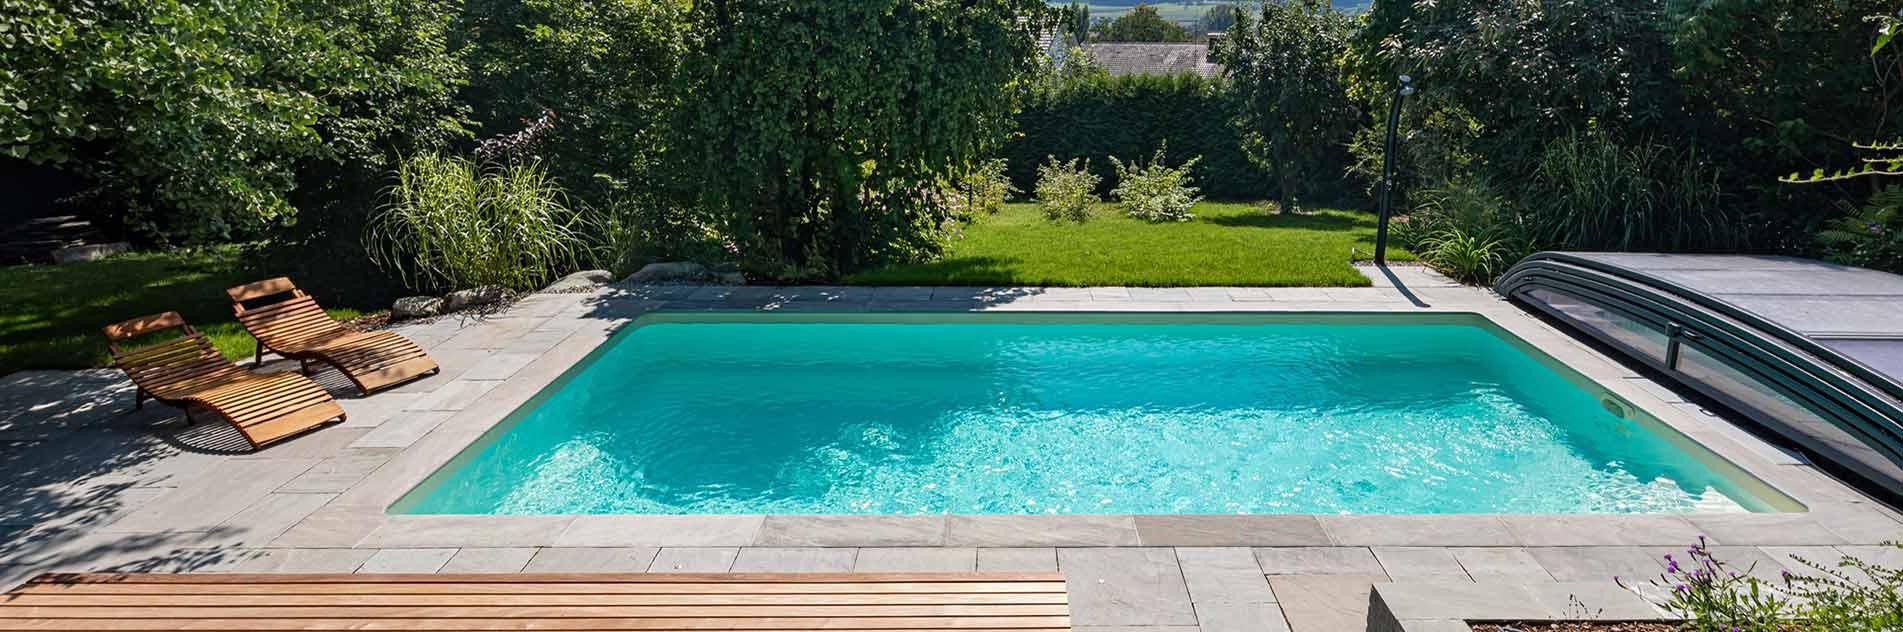 pool-abdeckung-bild